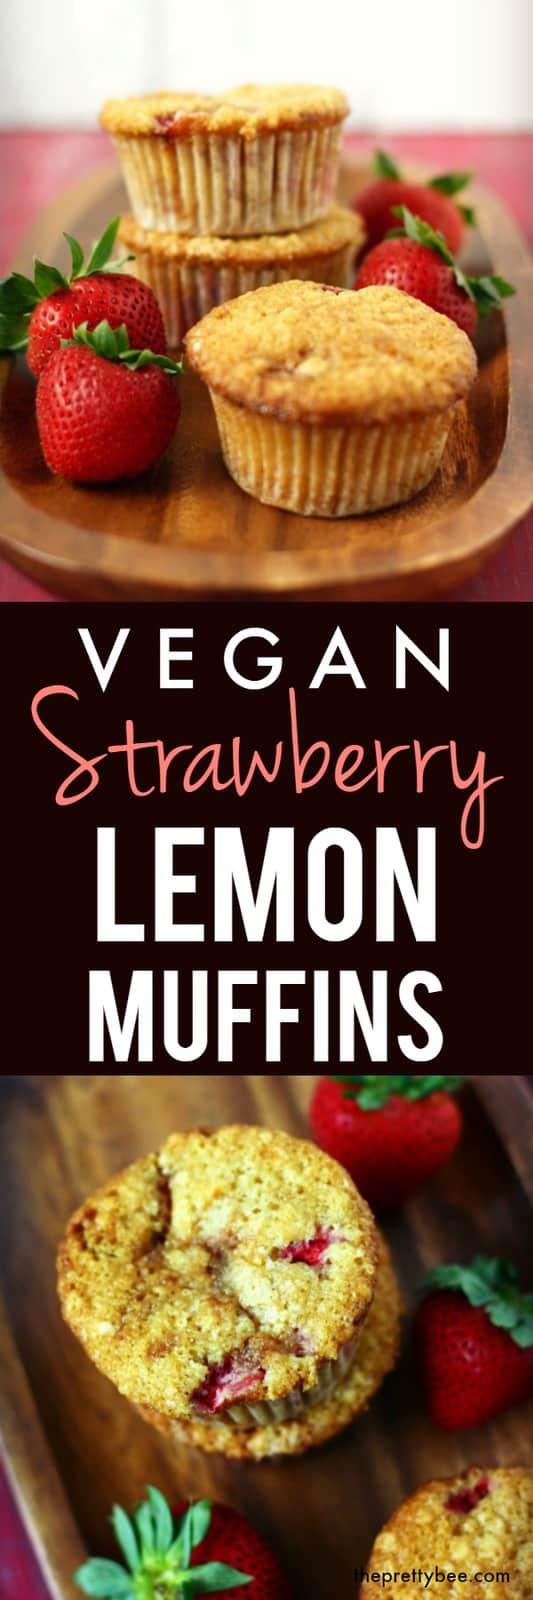 vegan strawberry muffin recipe